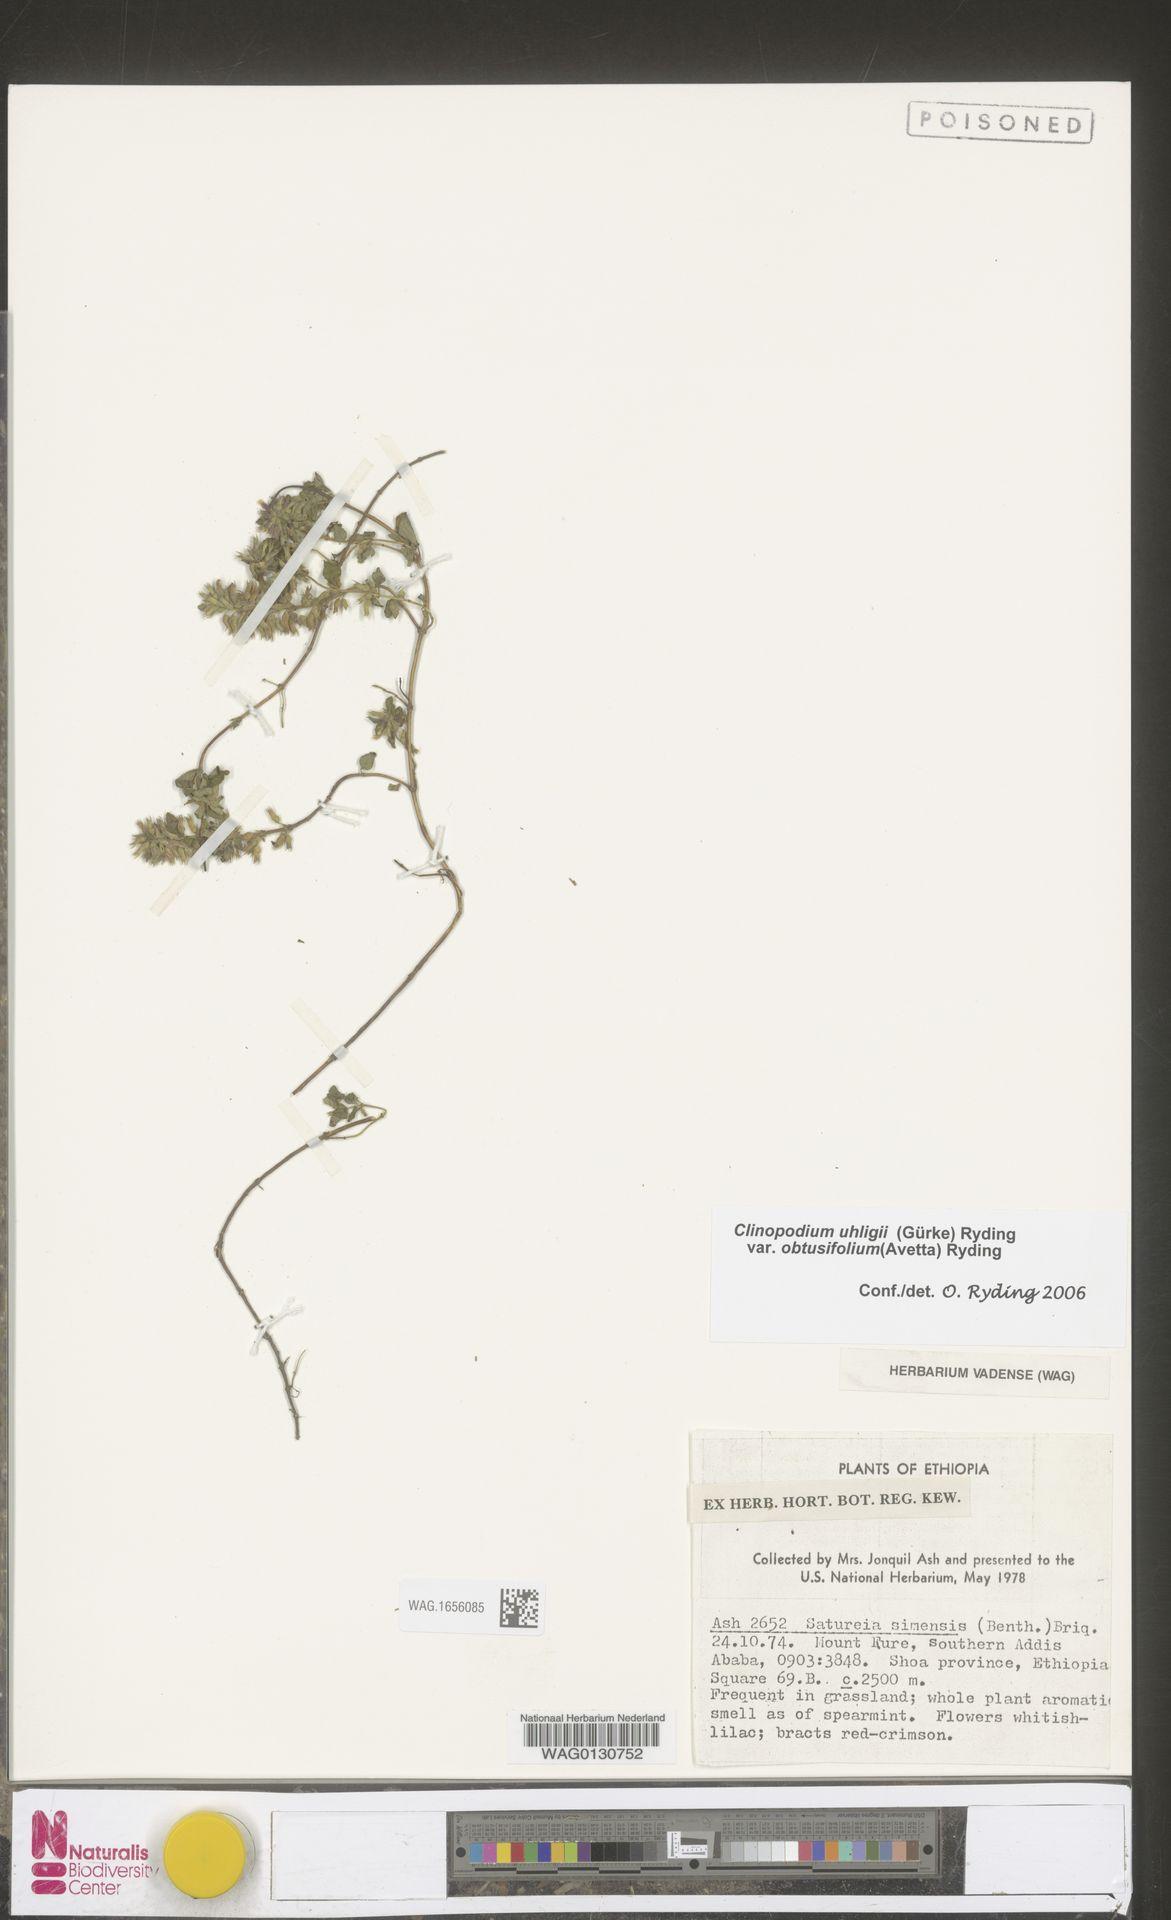 WAG.1656085 | Clinopodium uhligii var. obtusifolium (Avetta) Ryding